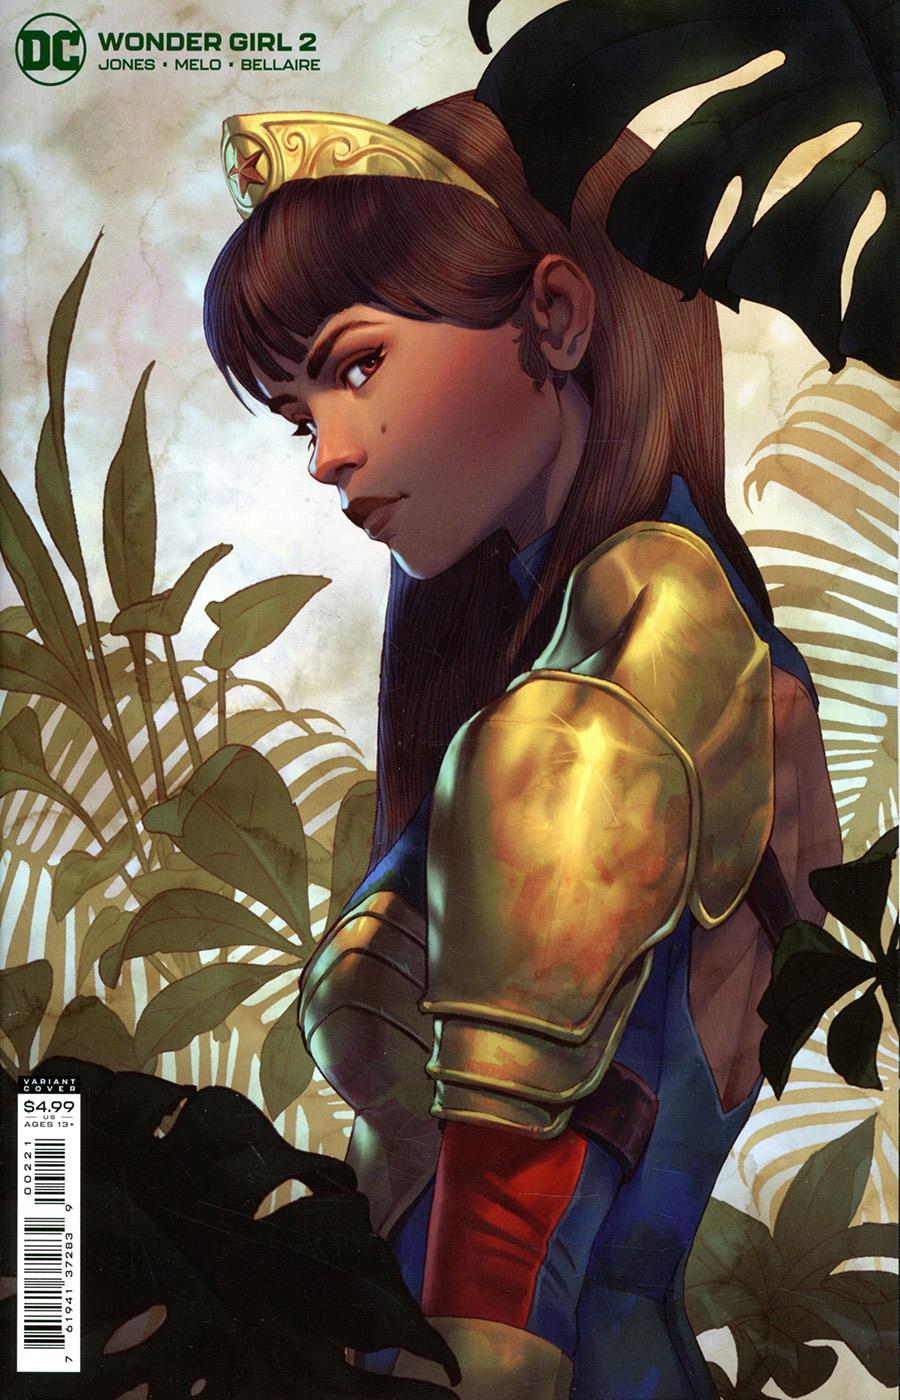 Wonder Girl Vol 2 #2 Cover B Variant Will Murai Card Stock Cover